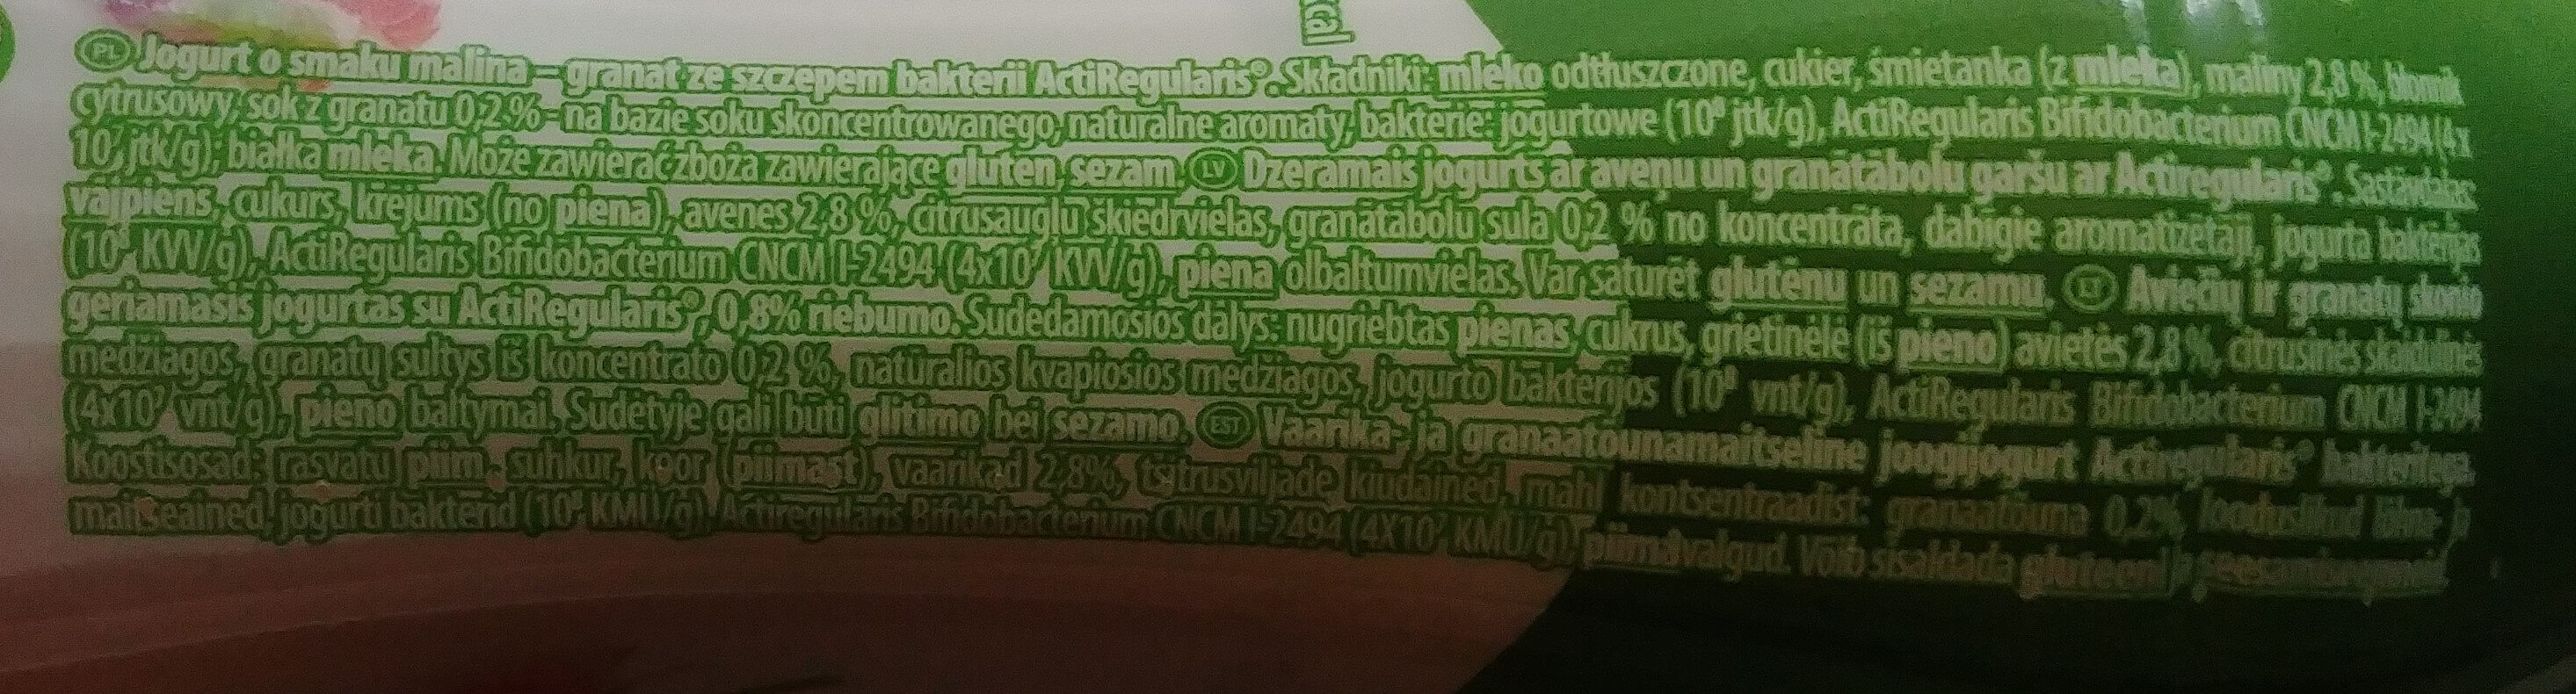 Activia malina, granat - Składniki - pl